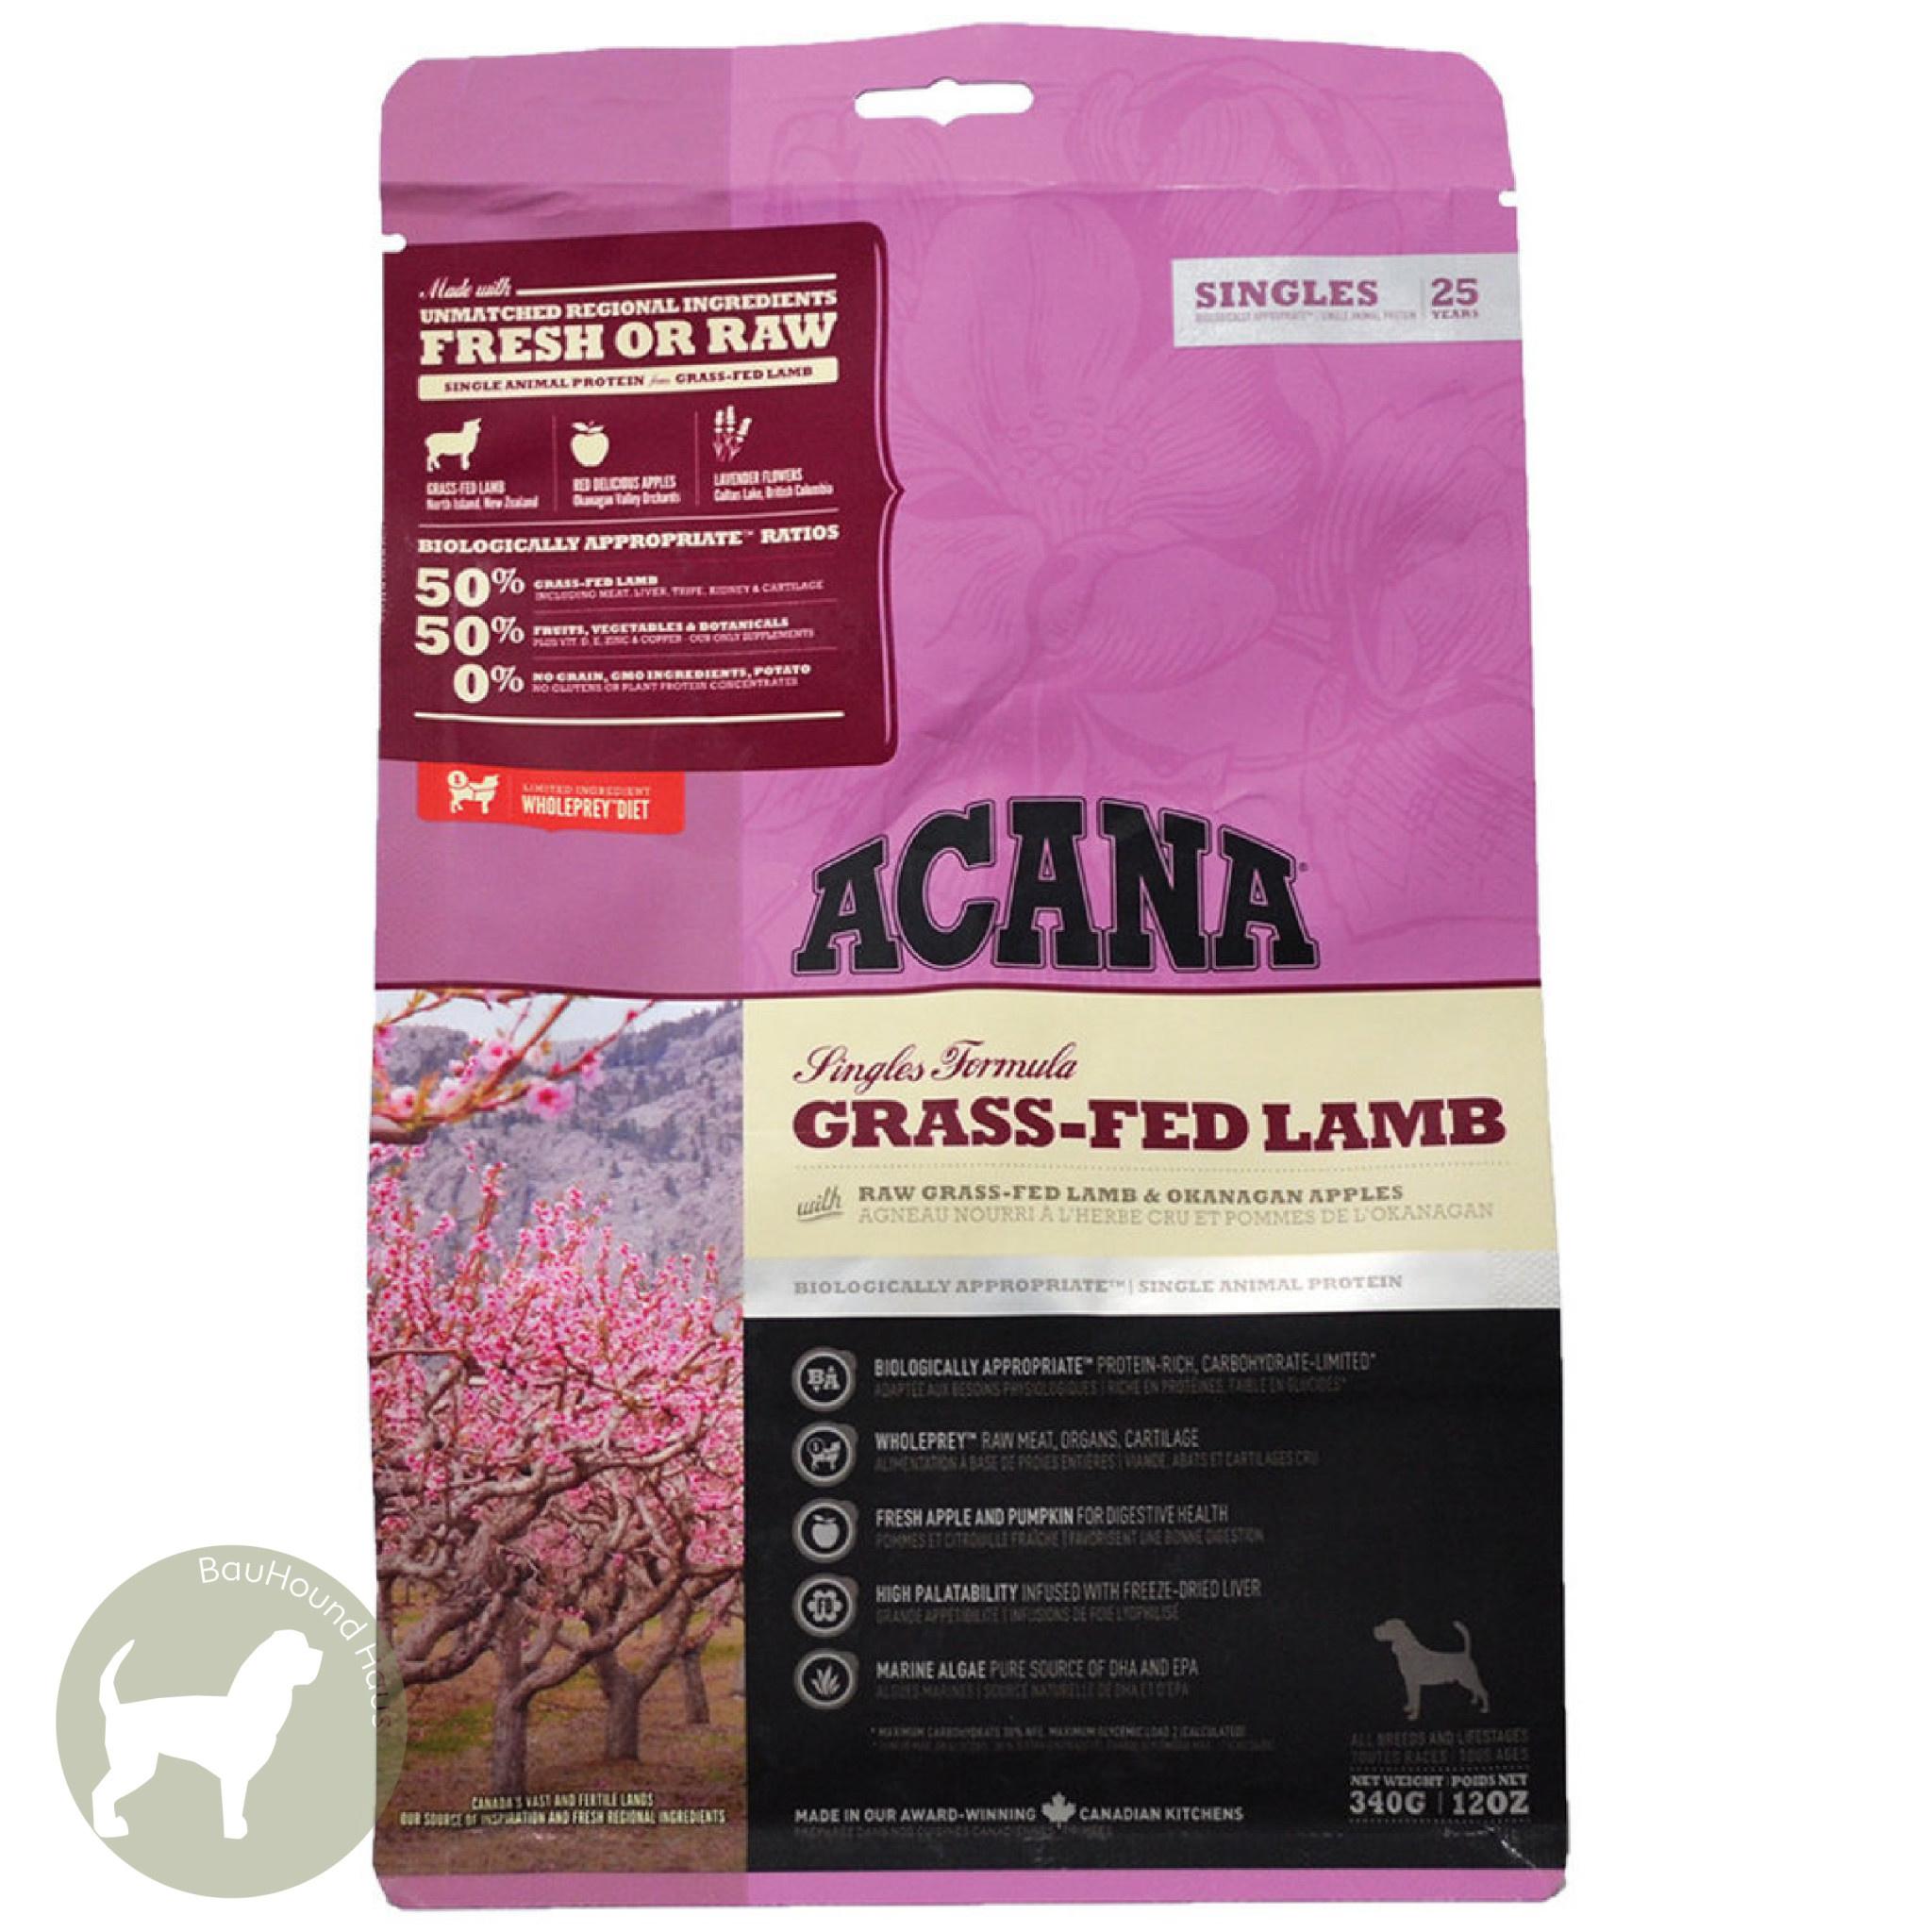 Acana Acana SINGLES Grain Free Grass Fed Lamb Kibble, 6kg